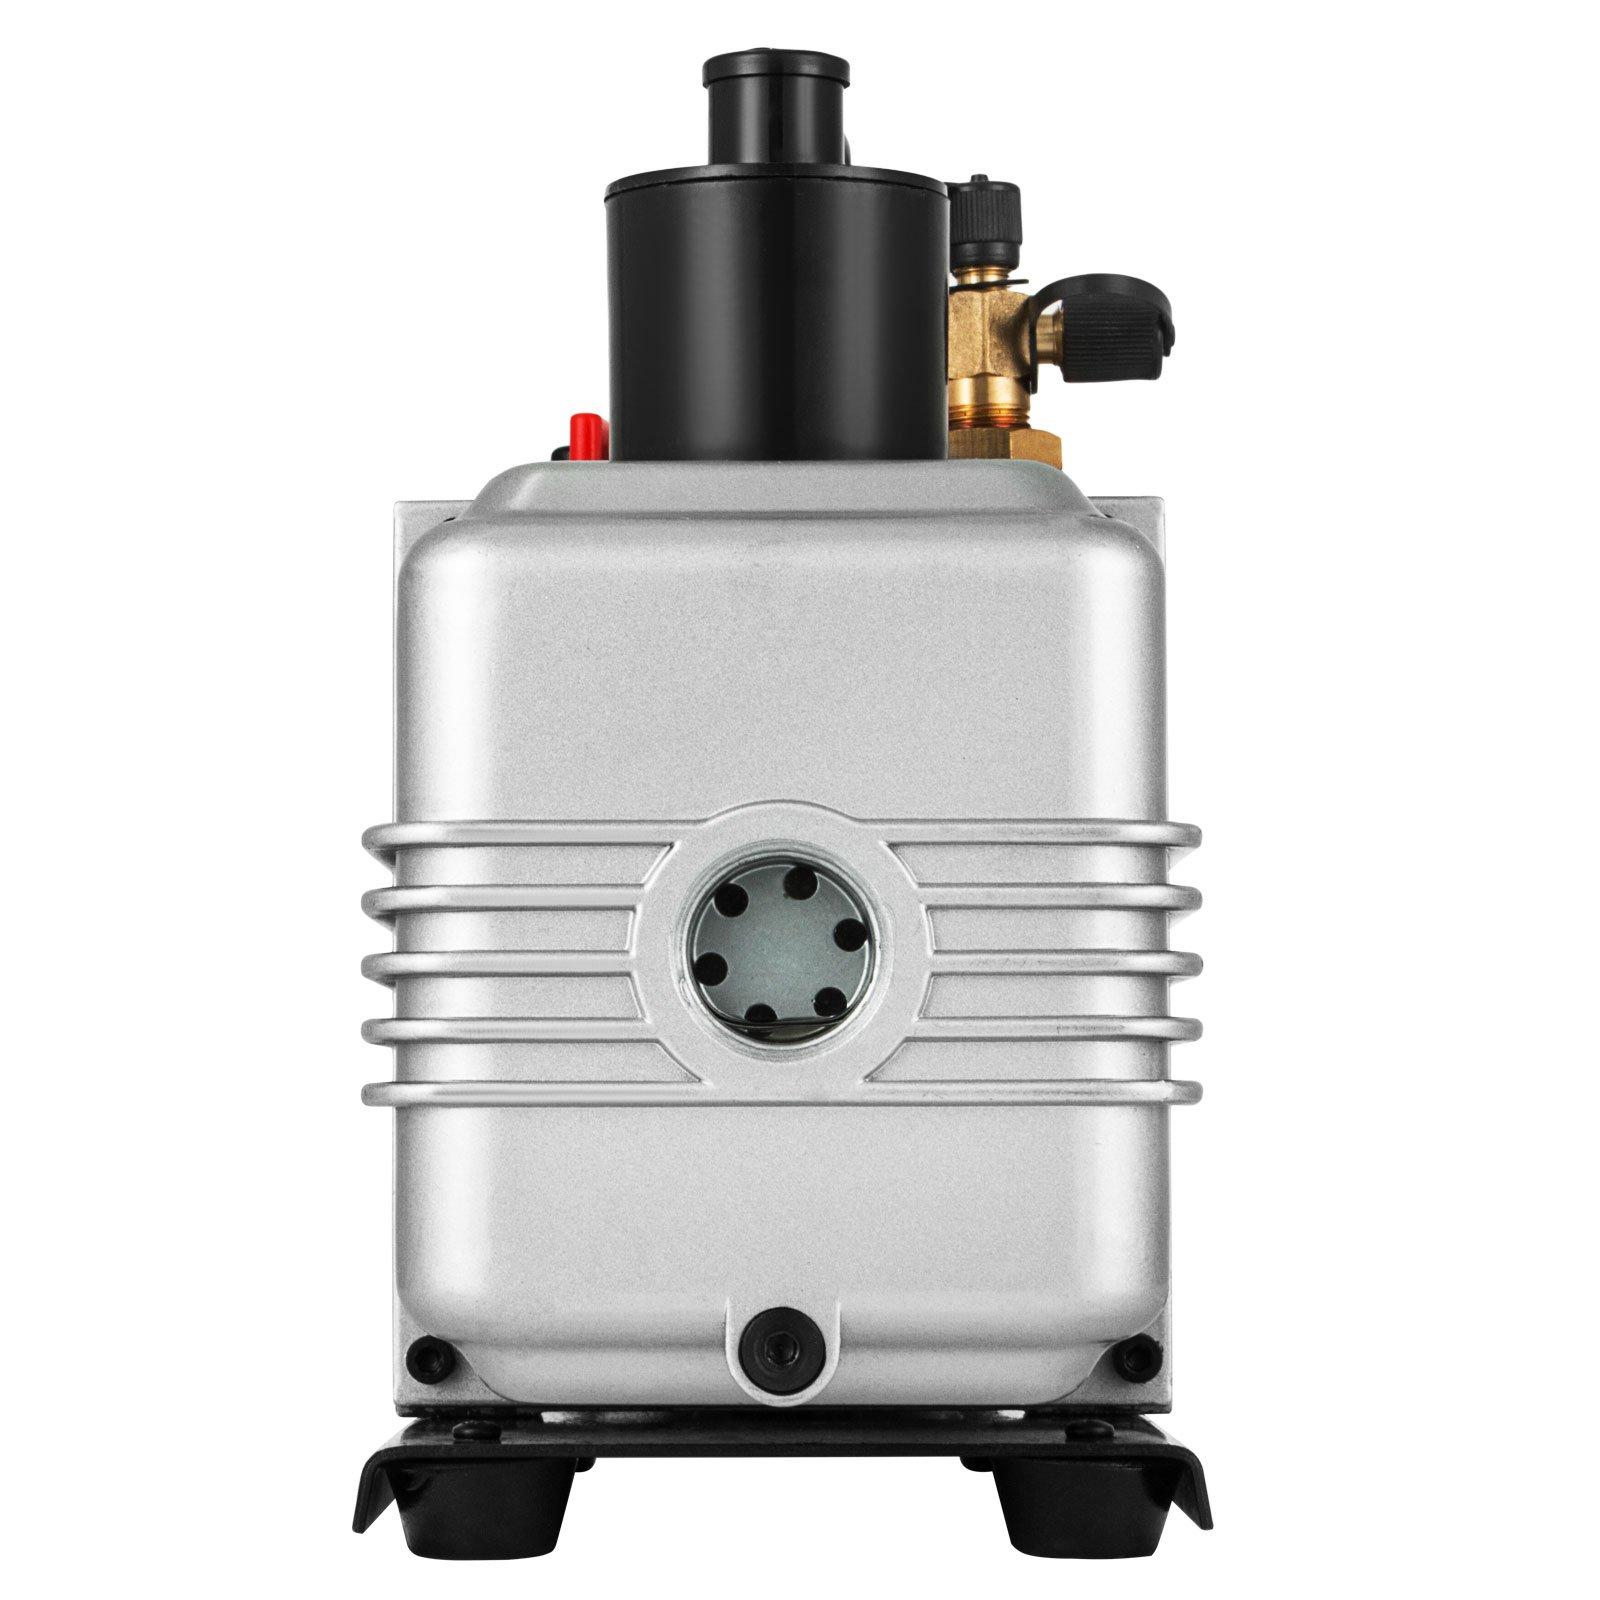 LOVSHARE 12CFM 1HP Vacuum Pump 110V 2 Meter Valve 1 Stage